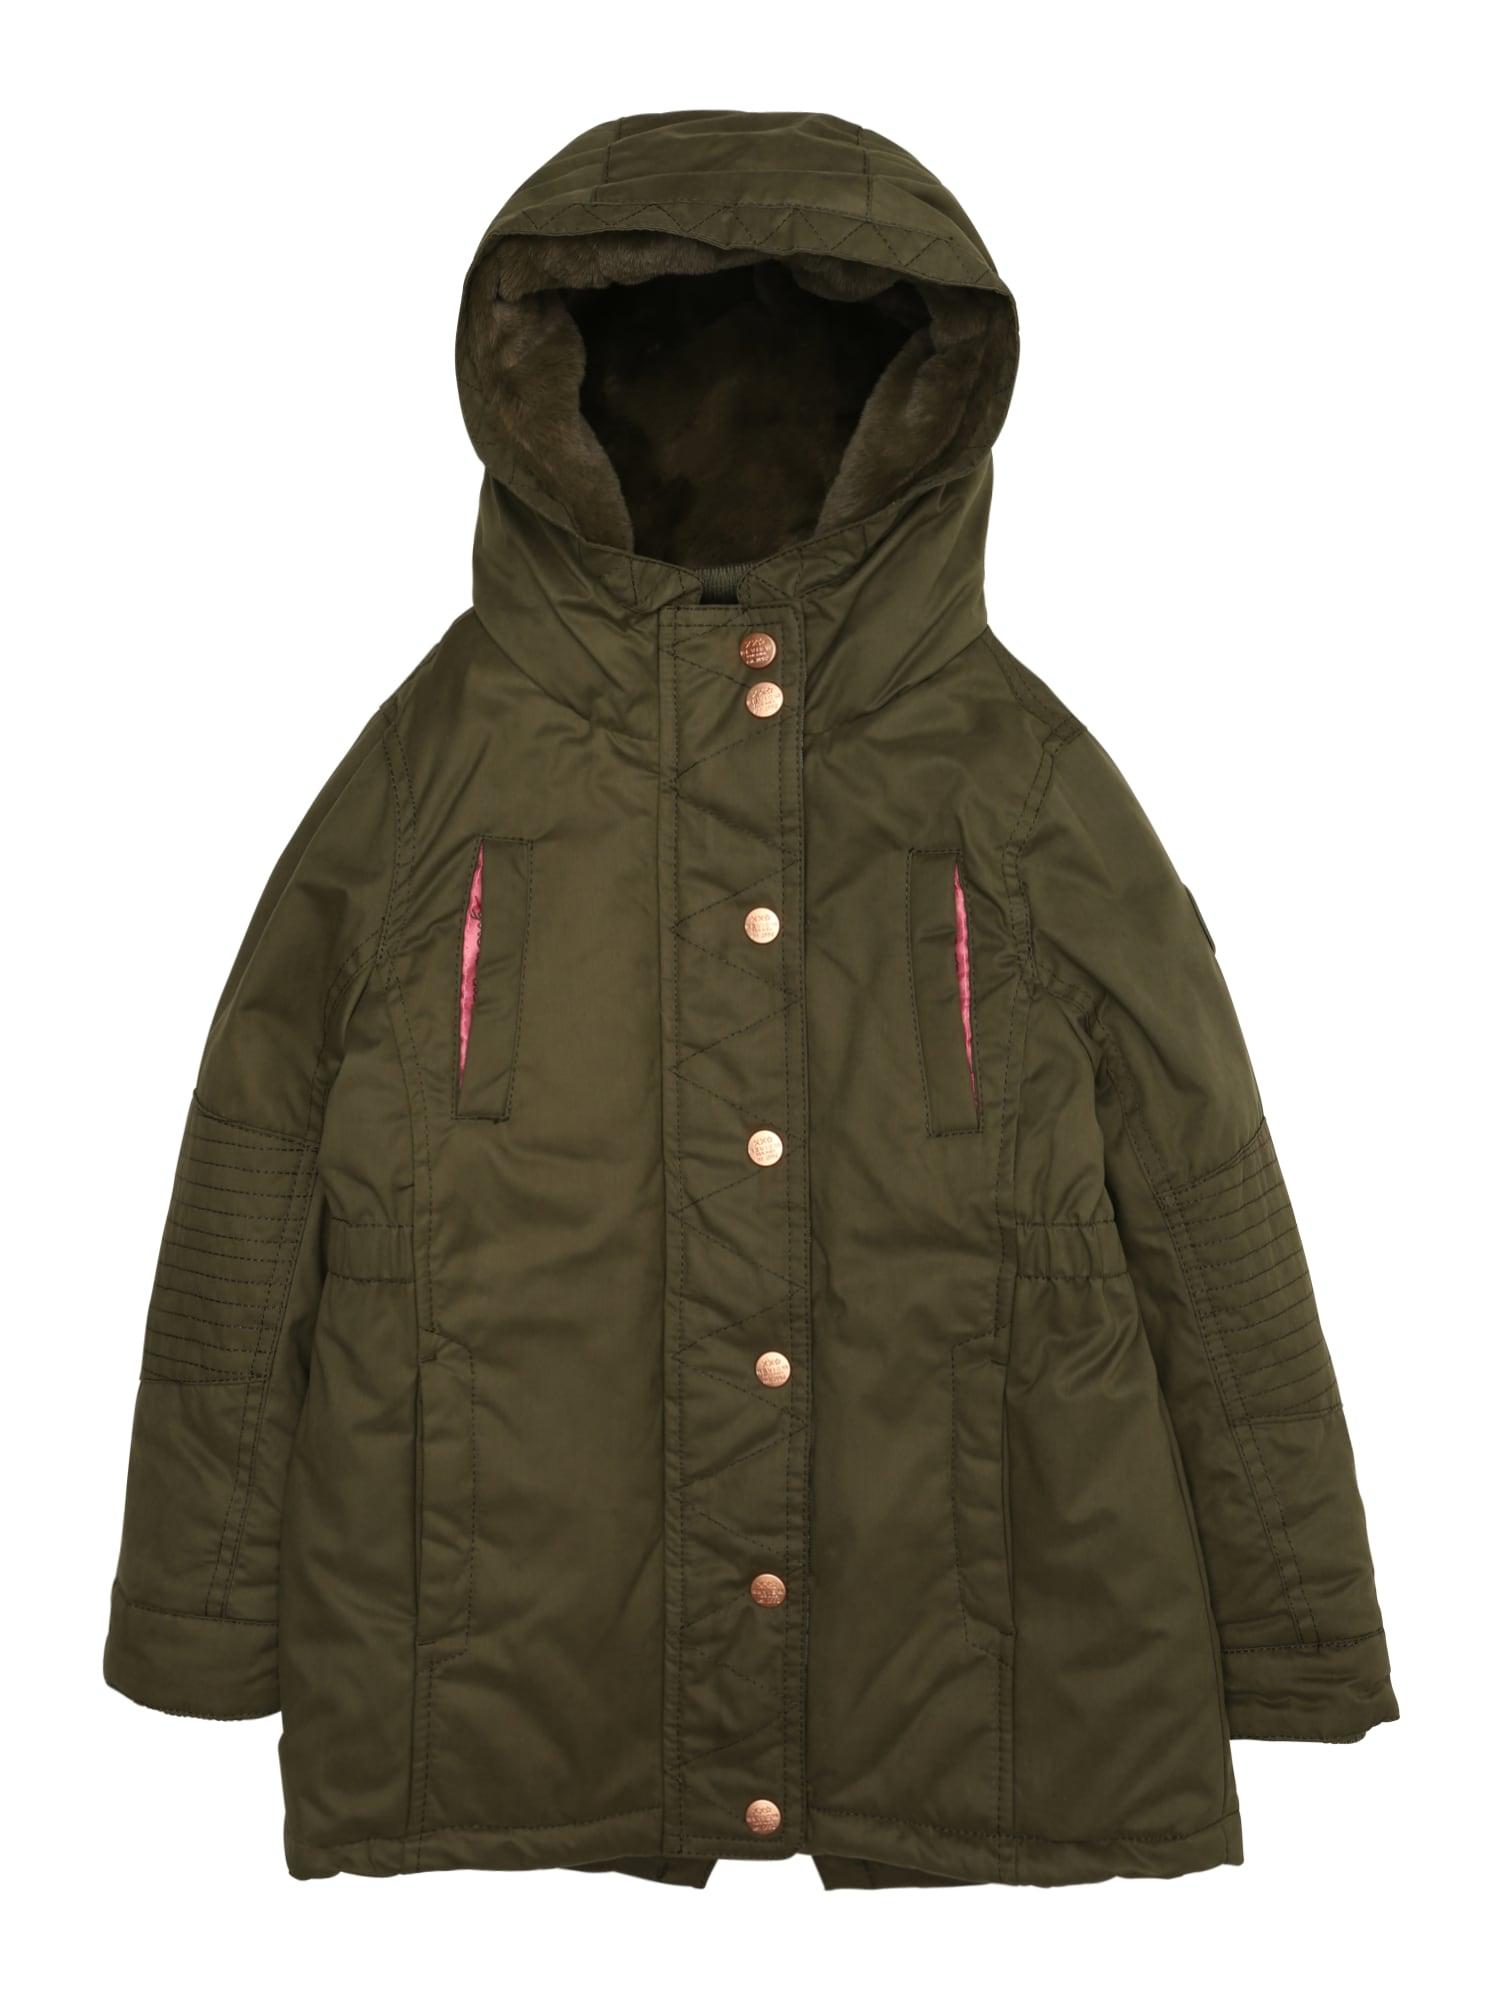 Zimní bunda KG-18-J901 khaki REVIEW FOR KIDS